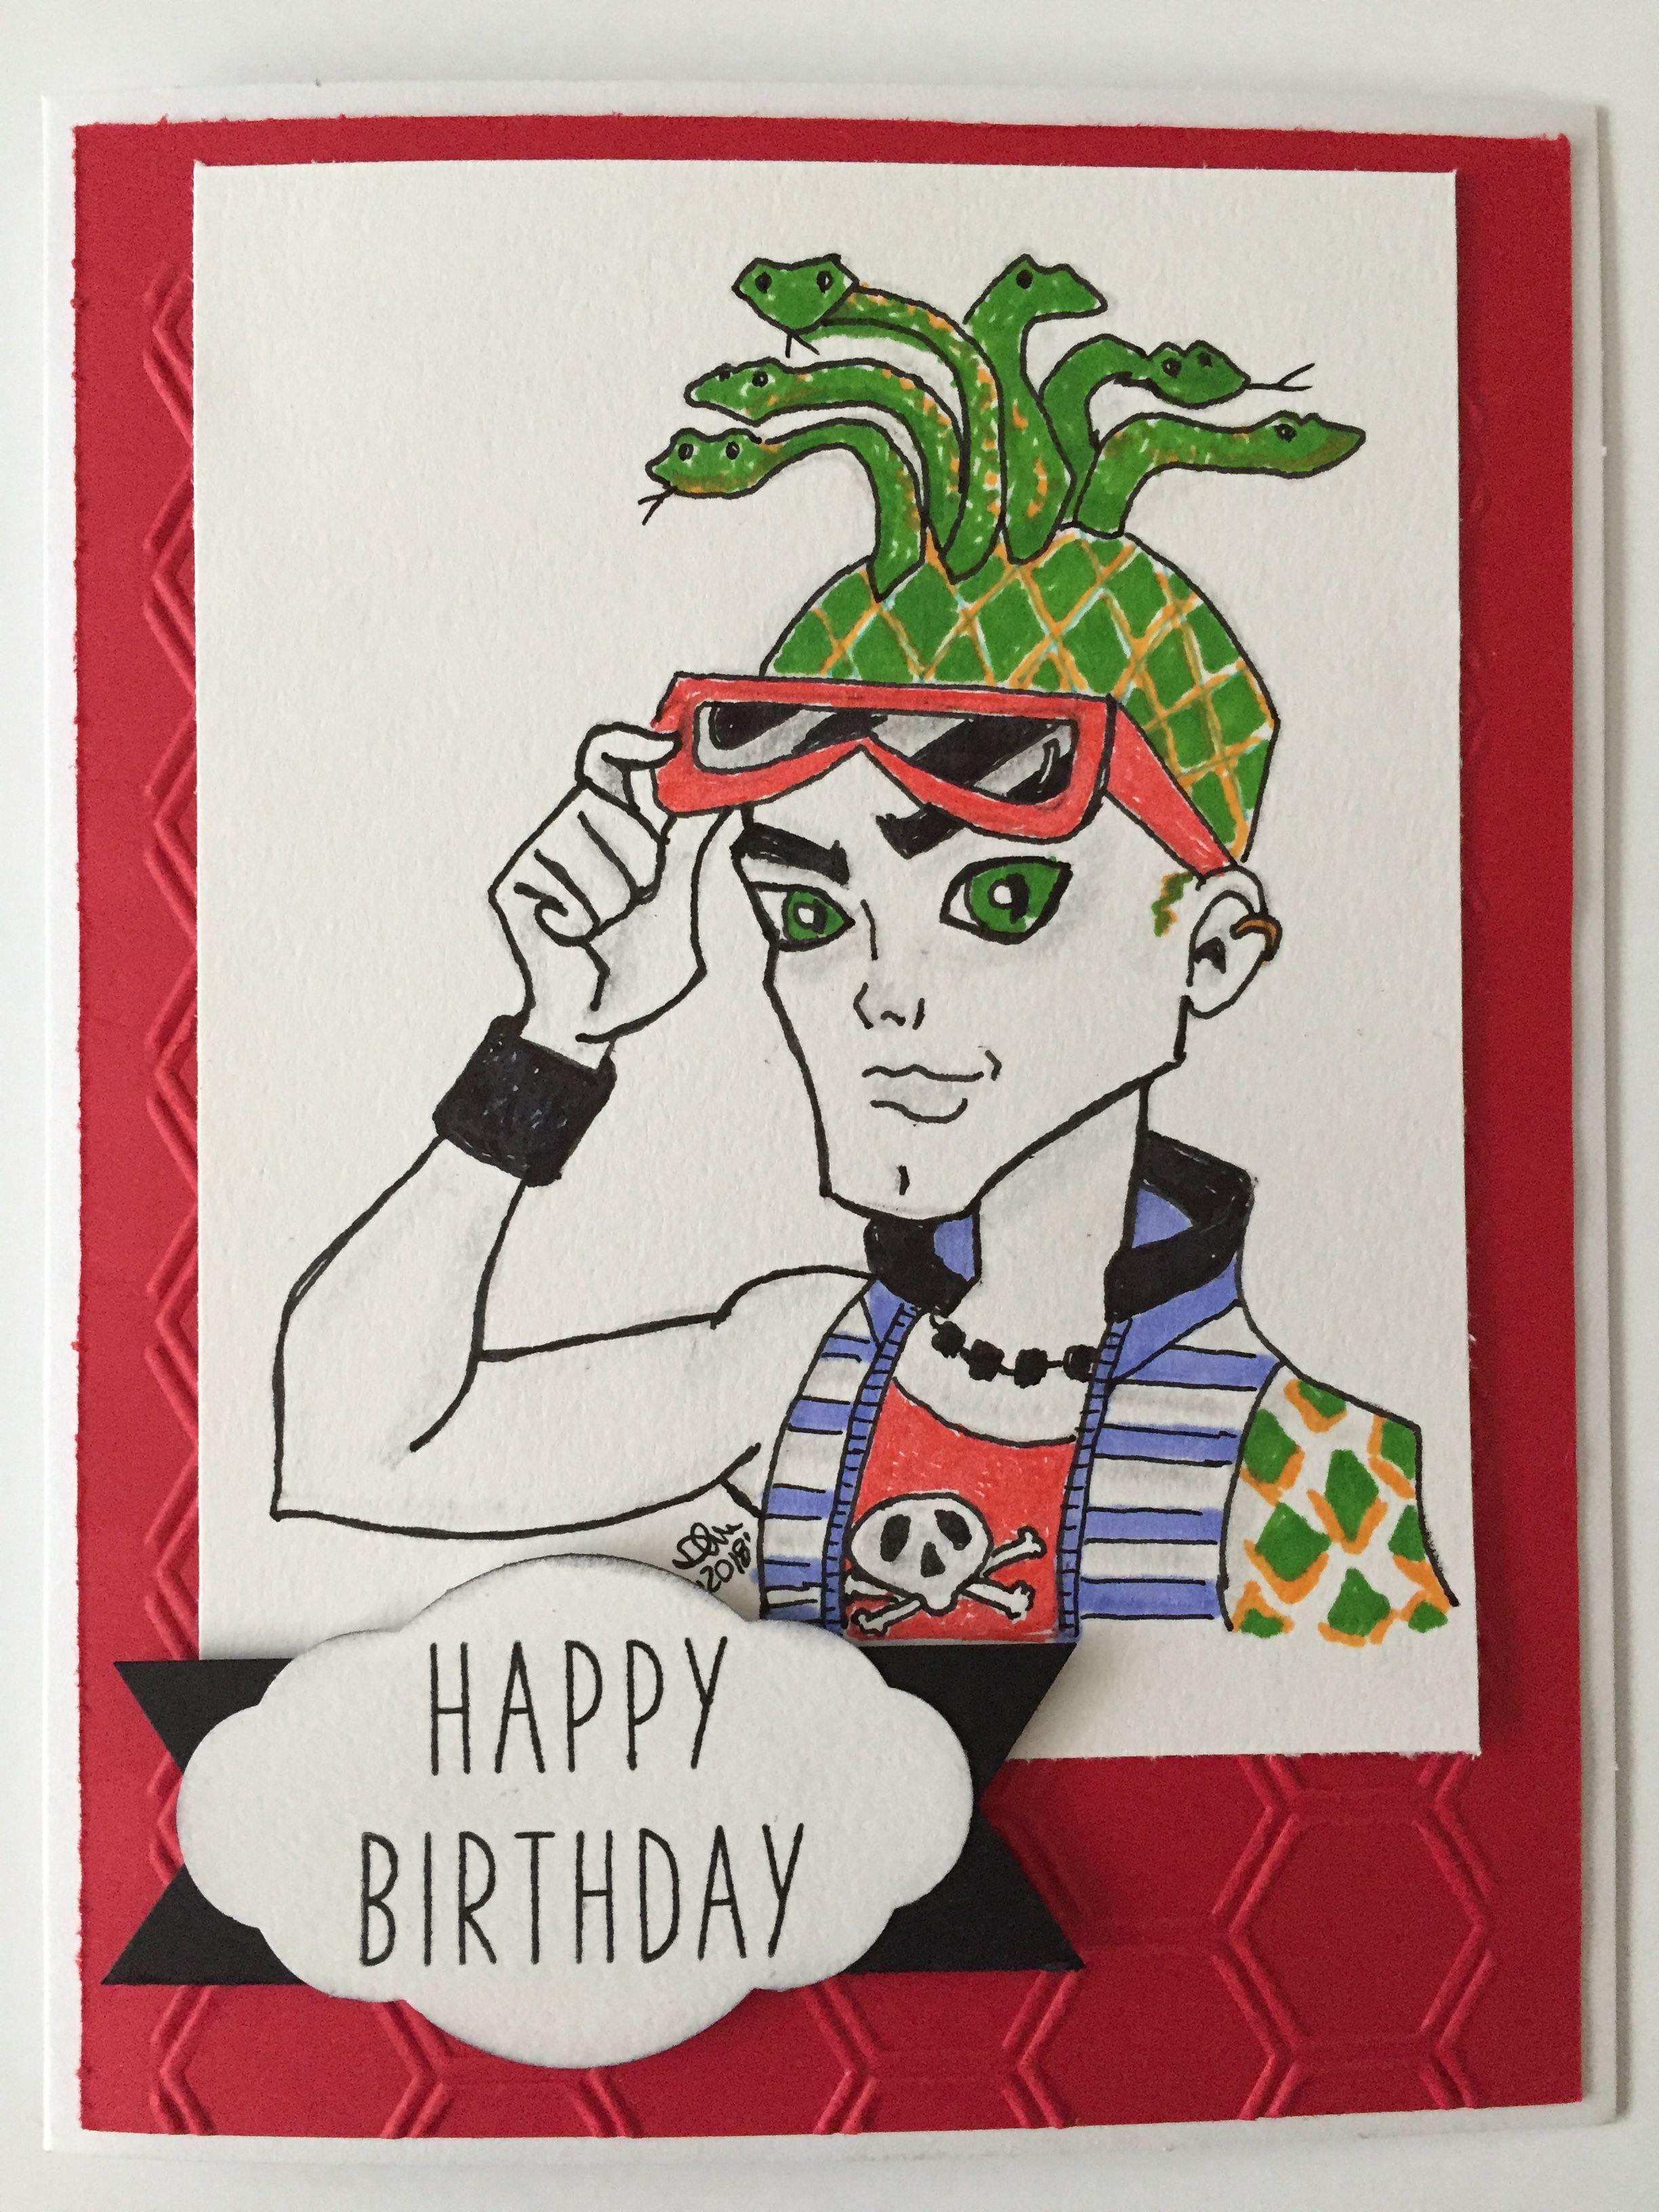 Deuce Gorgon Character Birthday Card Birthday Cards Cards Cards Handmade